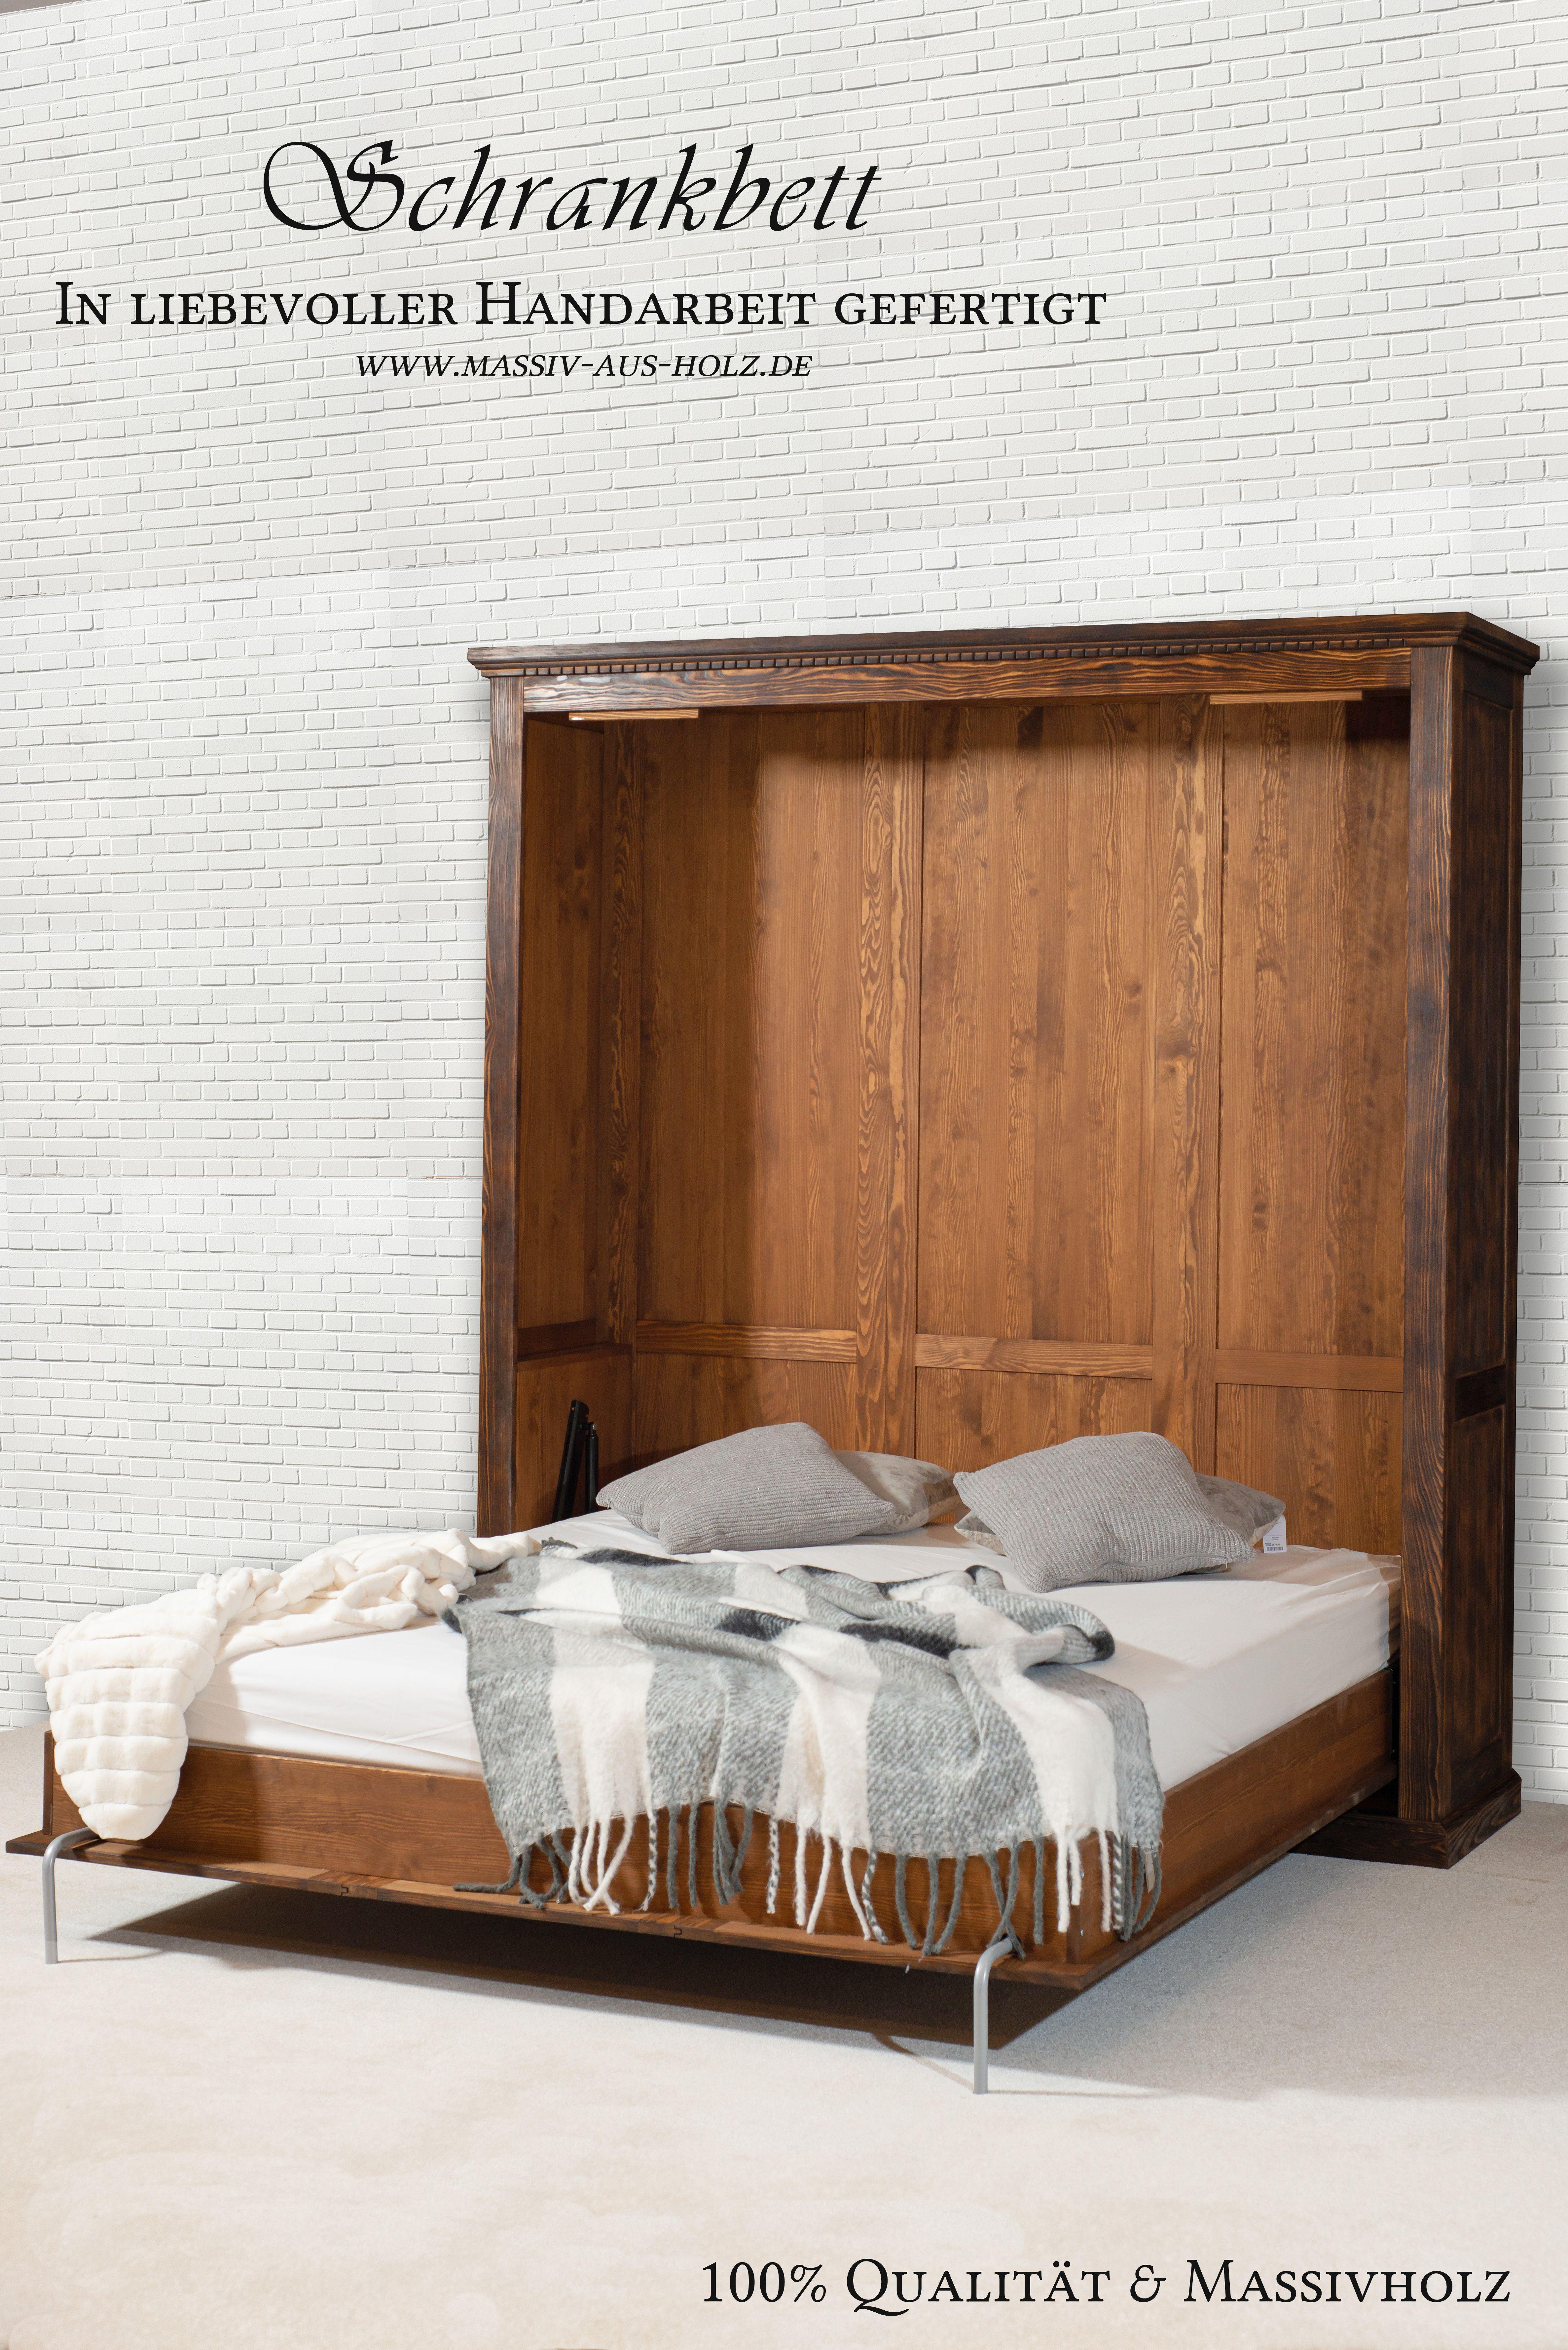 Schrankbett 100 Qualitat Massivholz Schrankbett Bett Landhaus Mobel